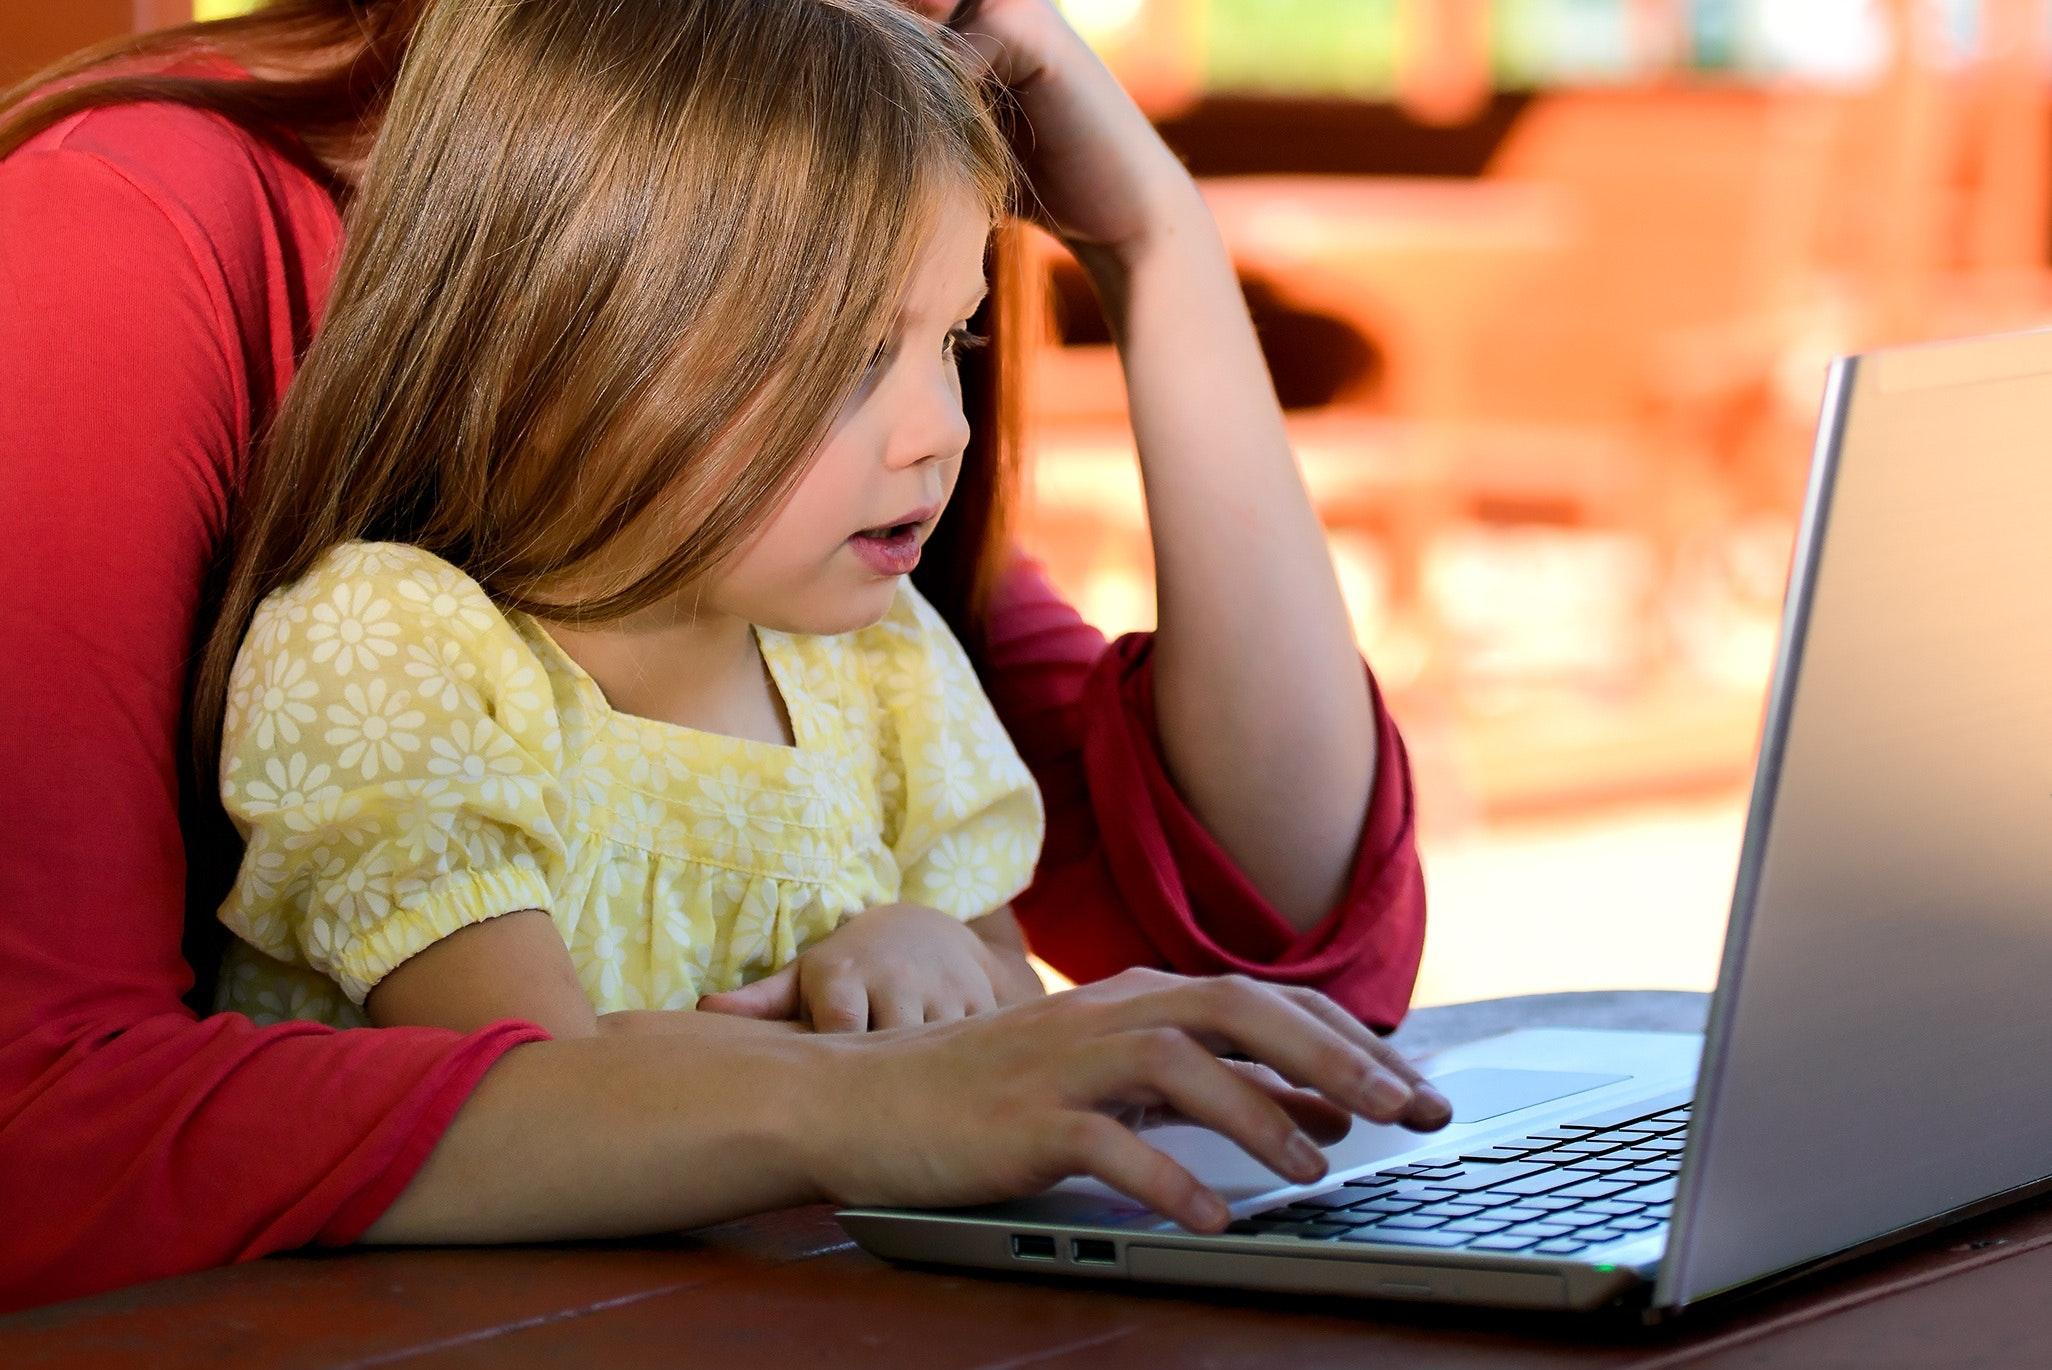 child-computer-cute-159848.jpg